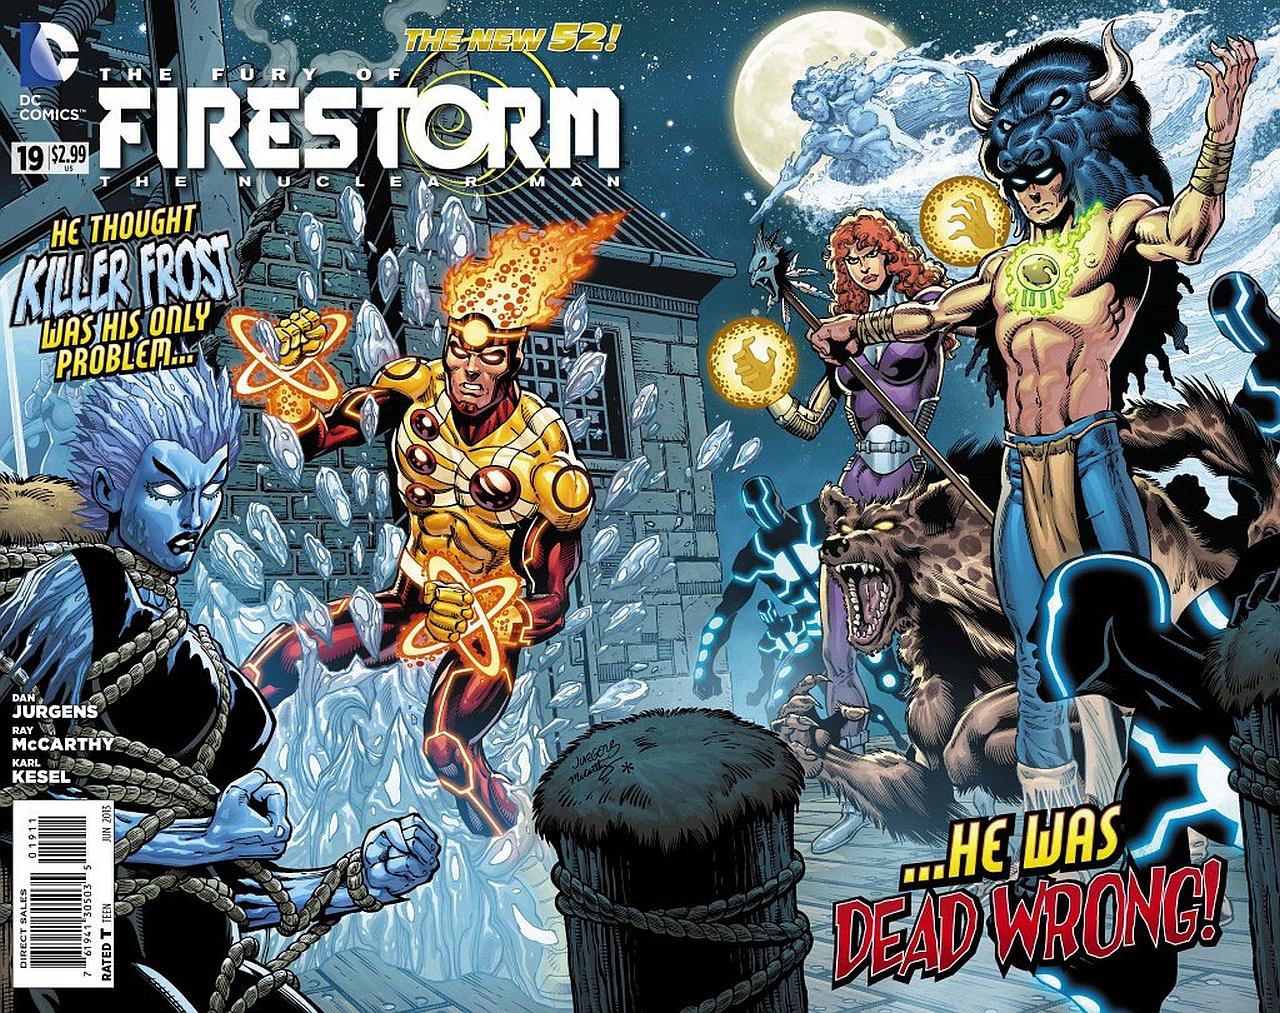 The Fury Of Firestorm: Firestorm